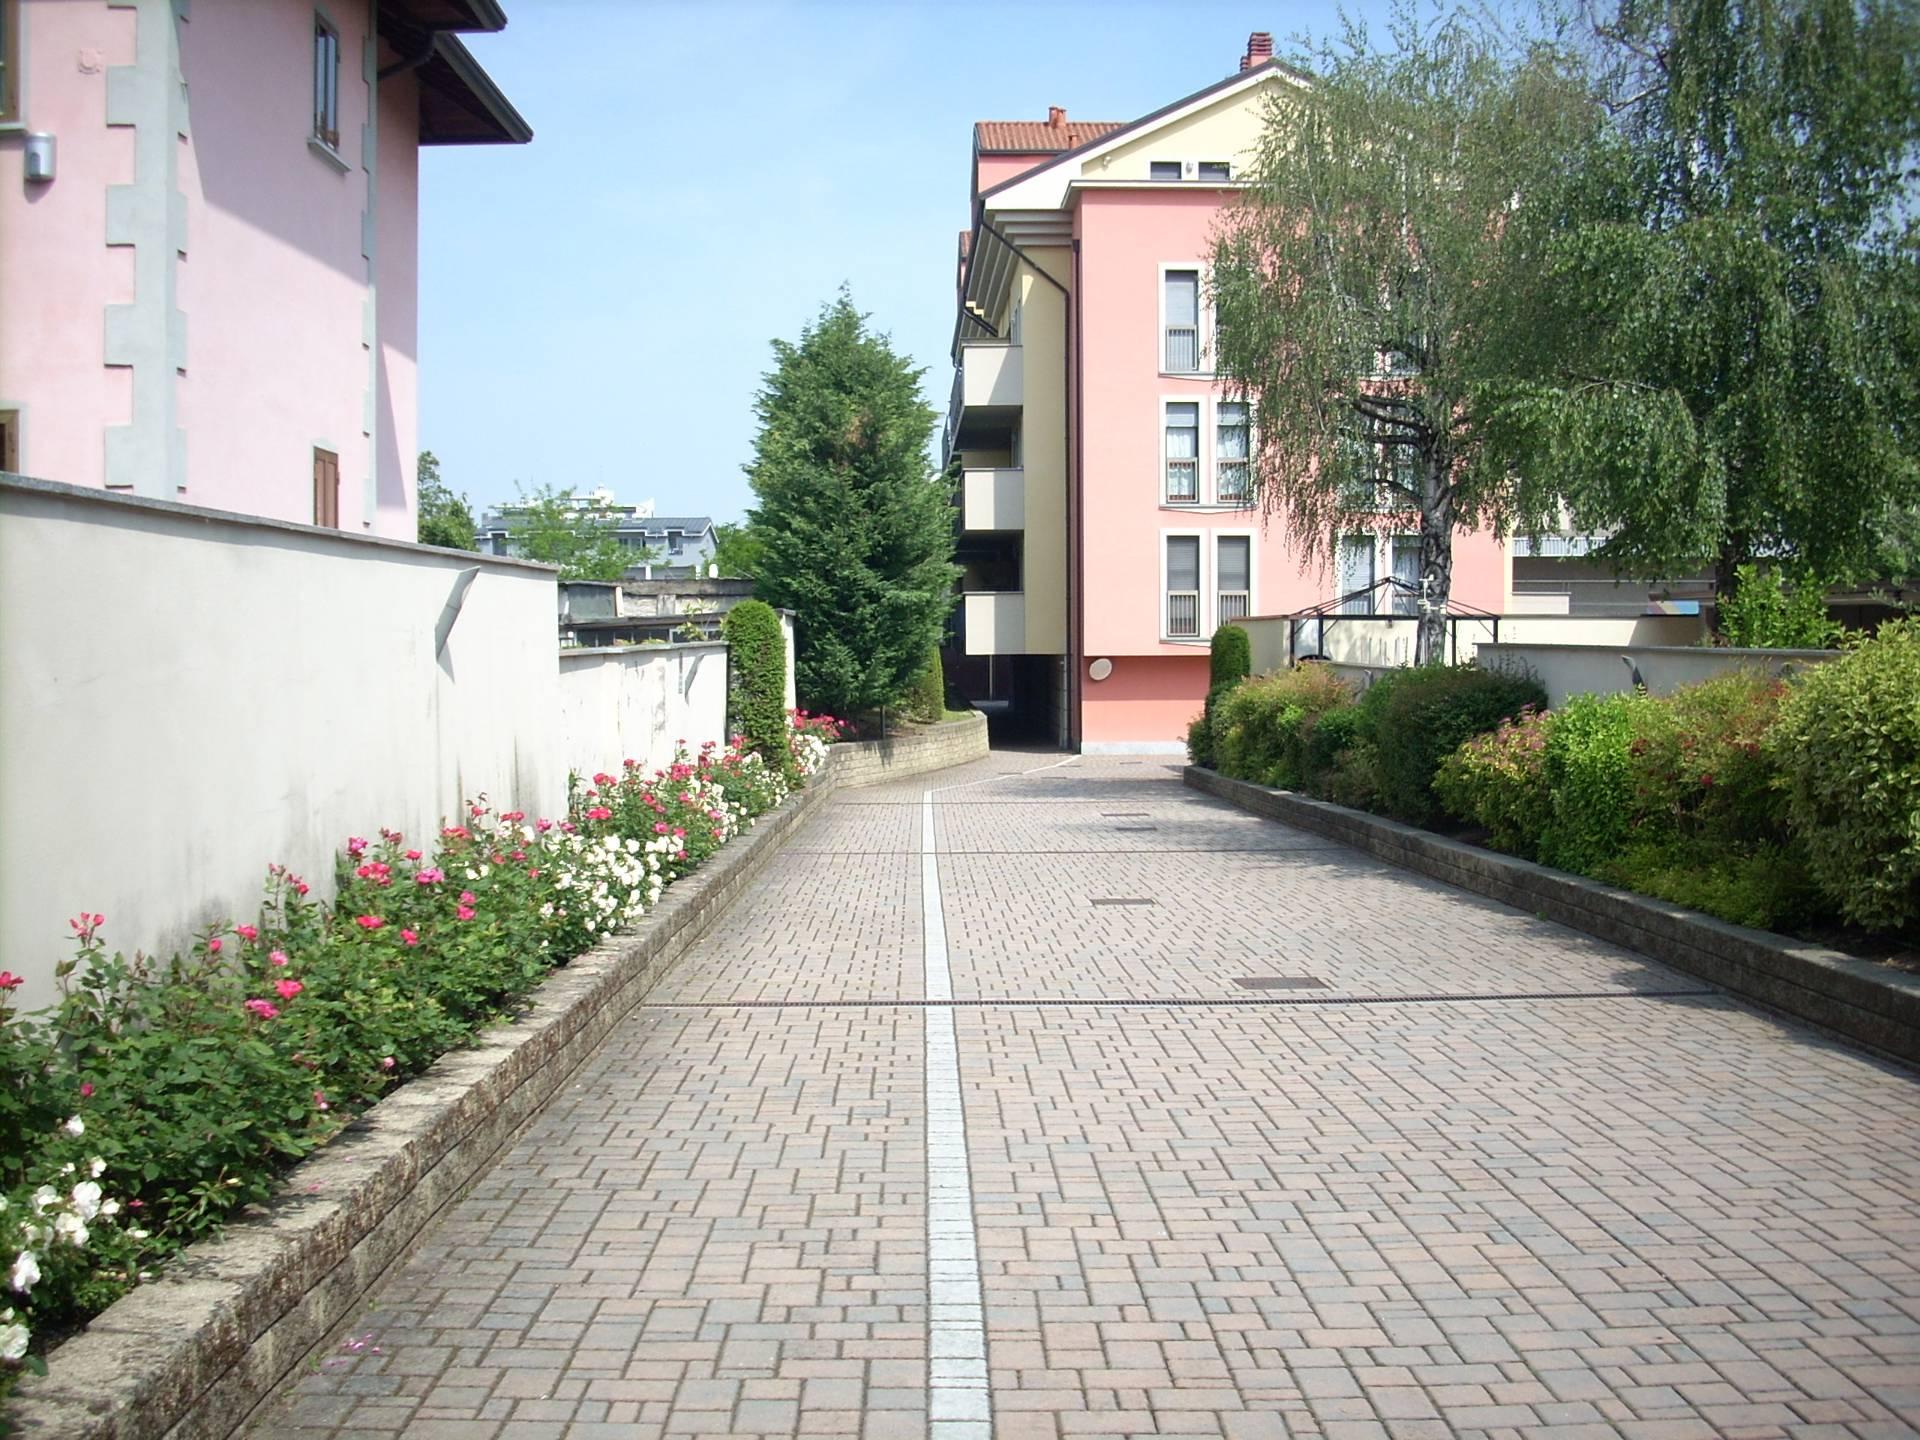 Vendita Box Garage/Posto Auto Legnano 140854